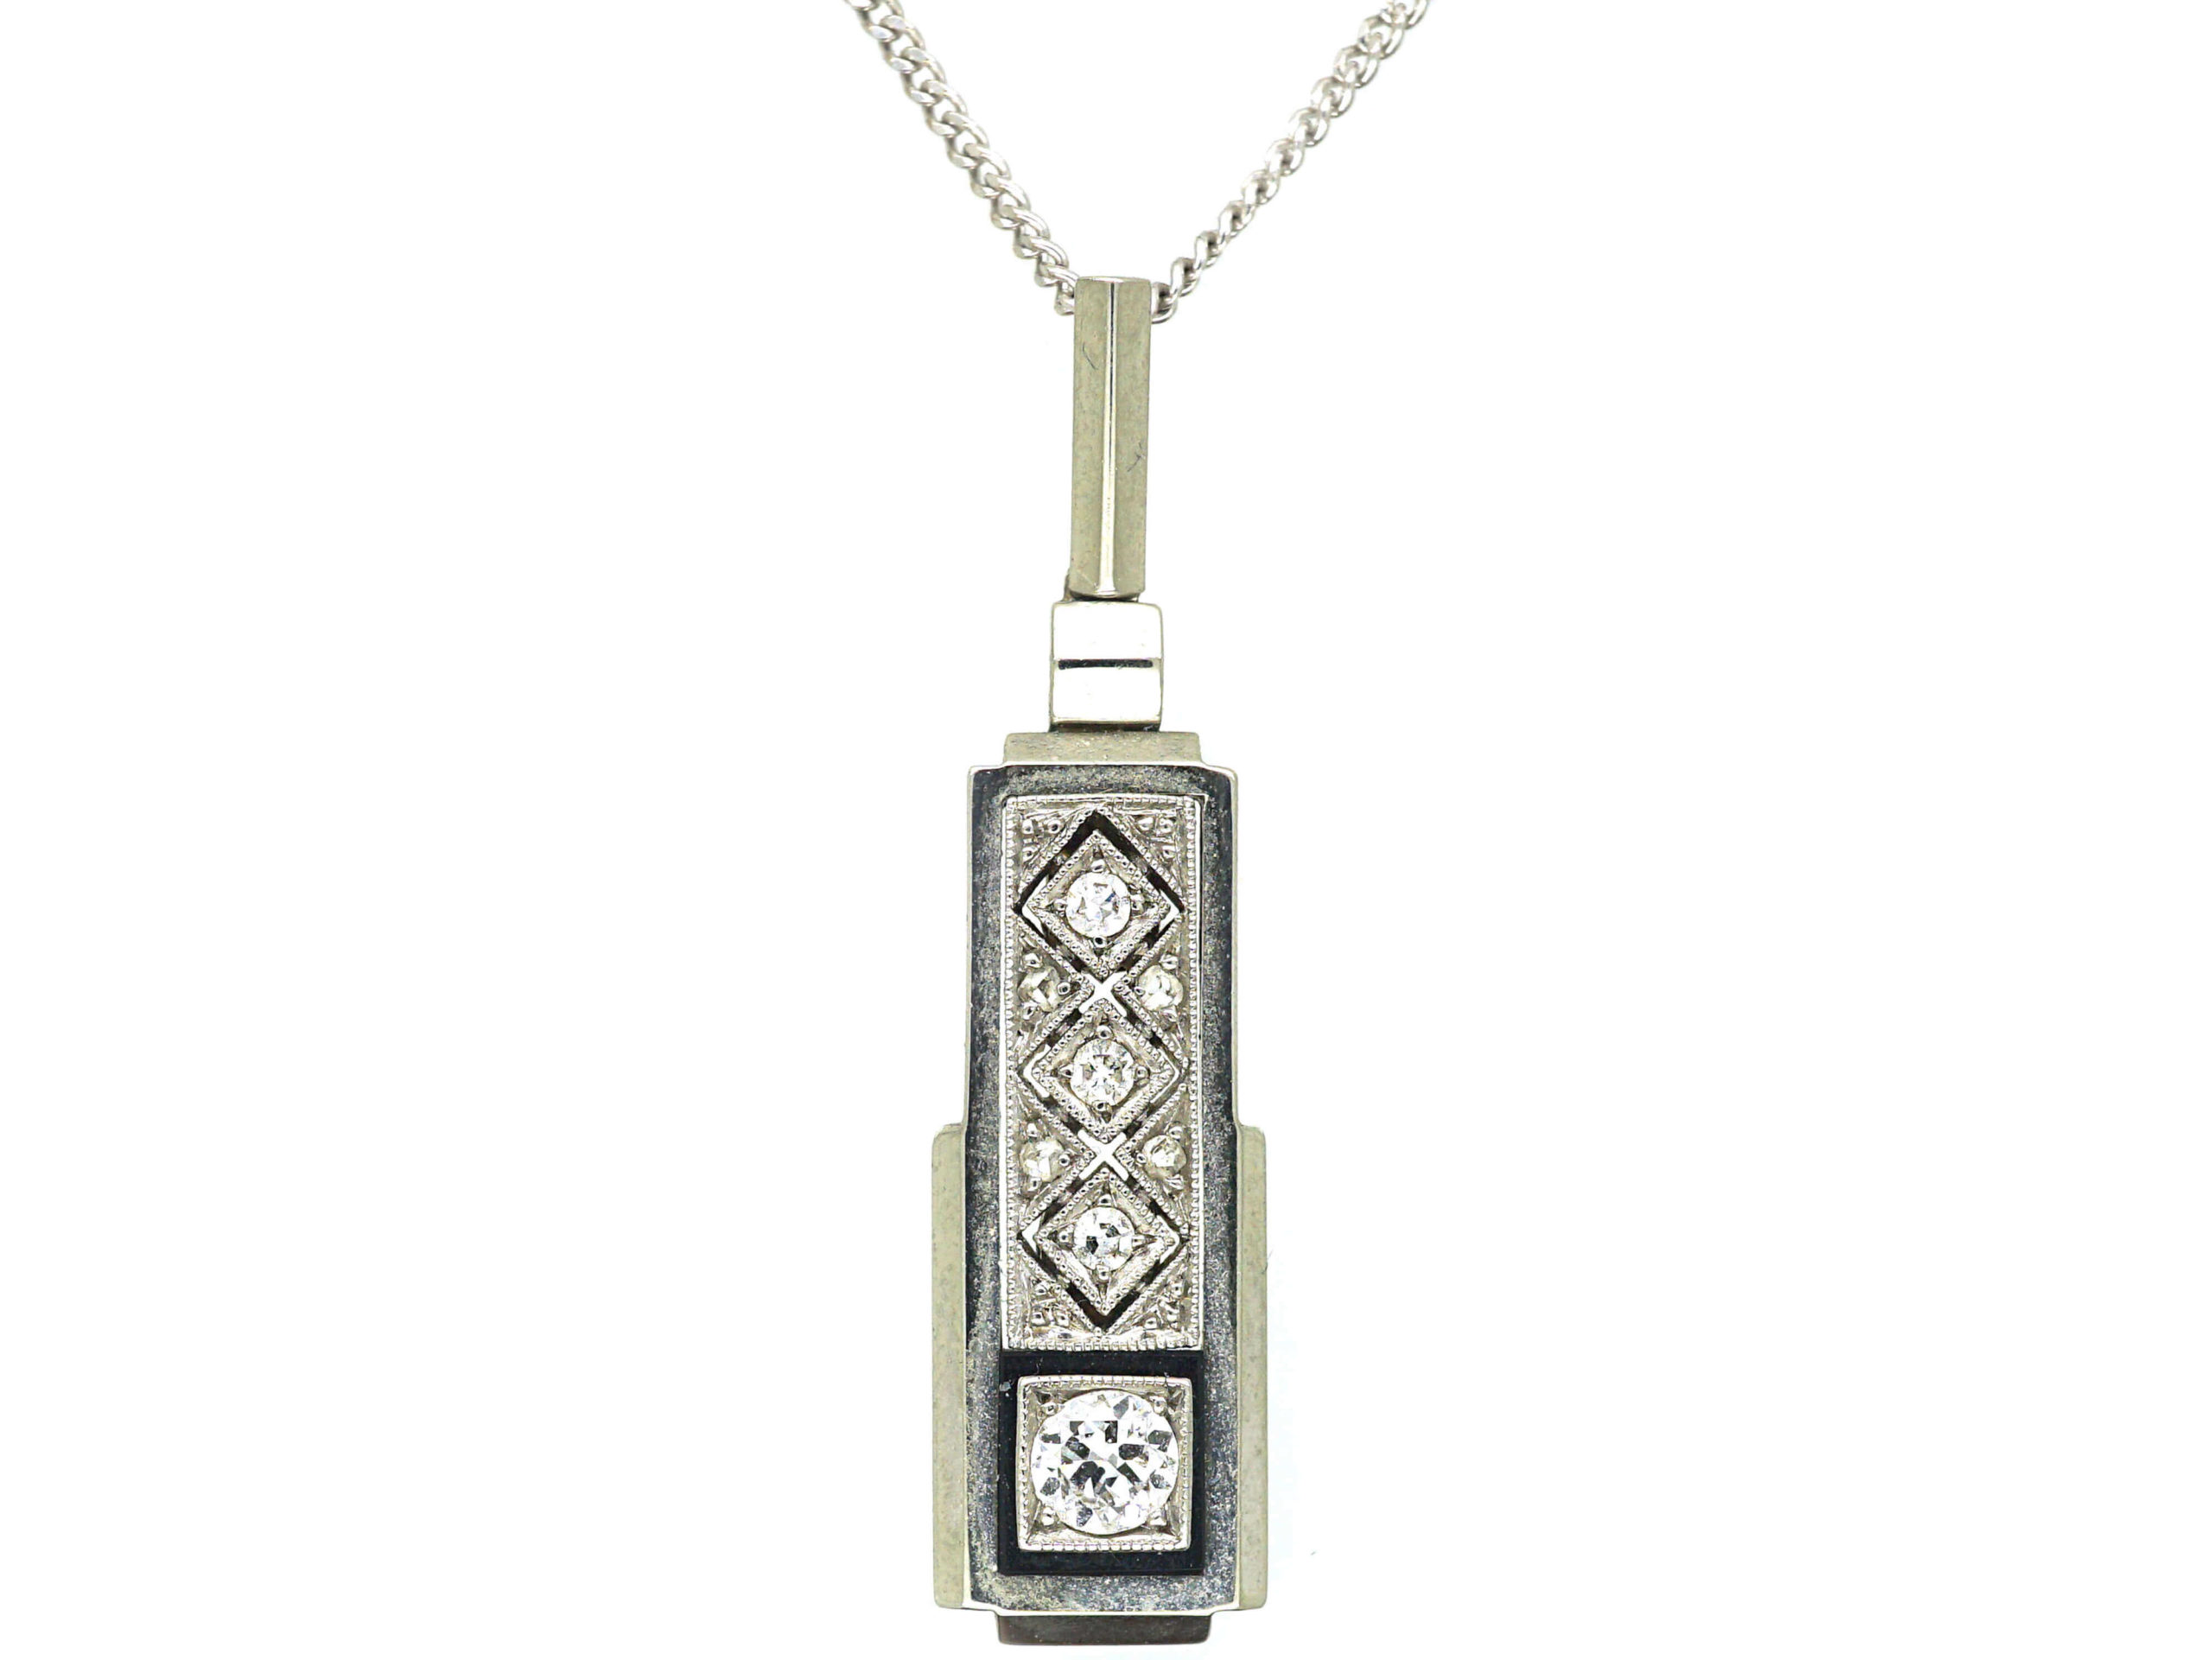 Art Deco 14ct White Gold, Diamond & Onyx Pendant on a Chain